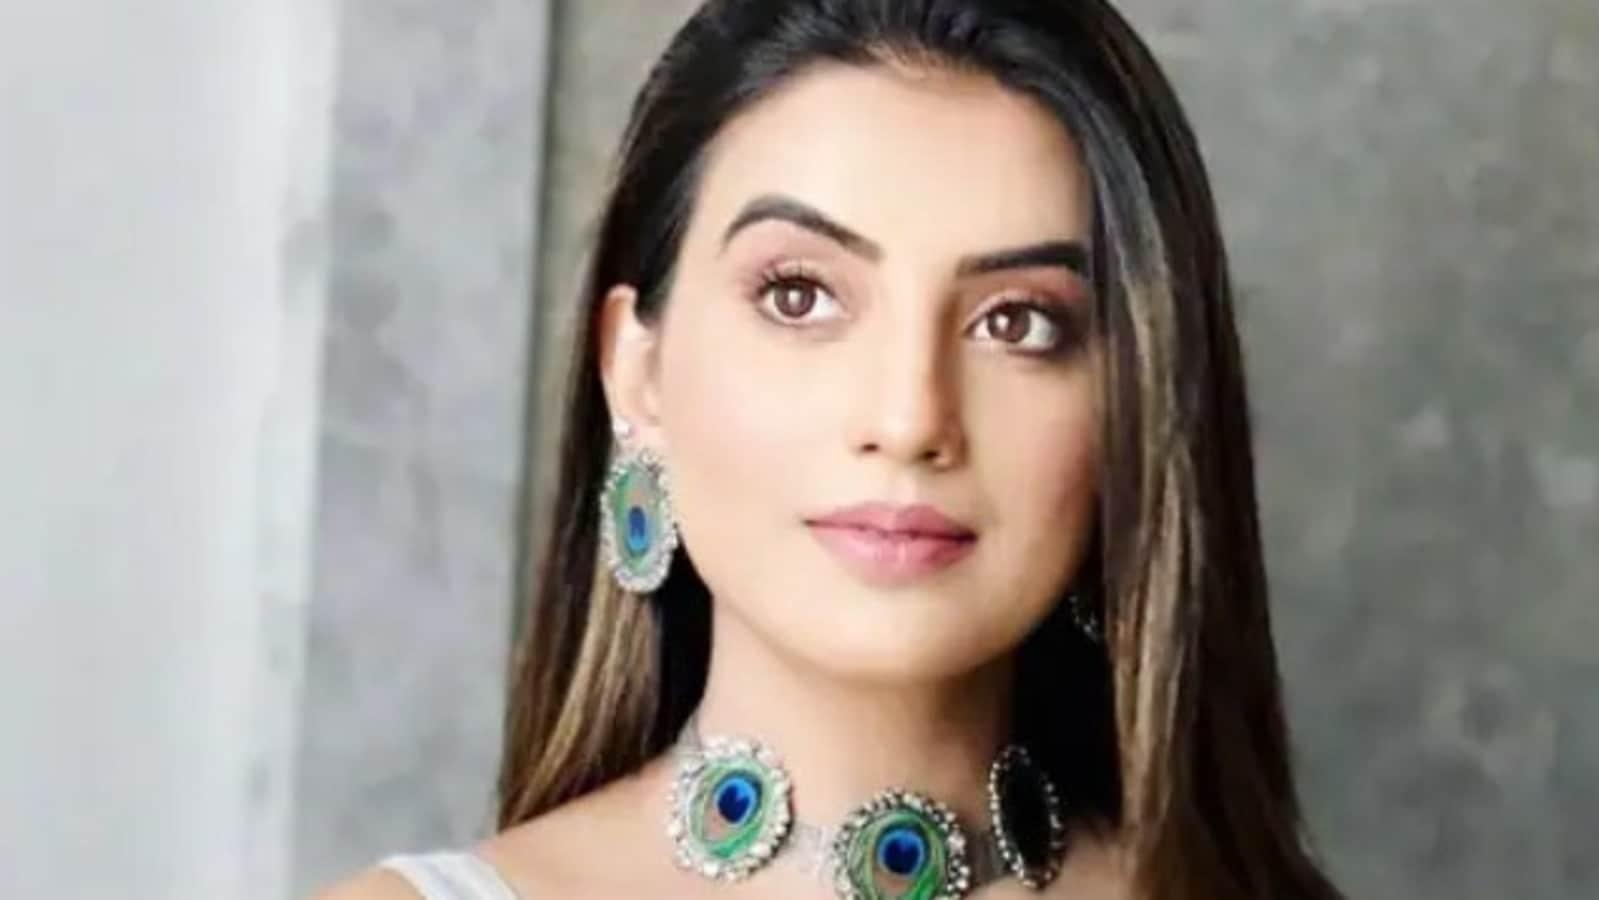 Bhojpuri star Akshara Singh breaks down on Bigg Boss OTT, says Moose  Jattana 'has no right to comment' on her work | Web Series - Hindustan Times